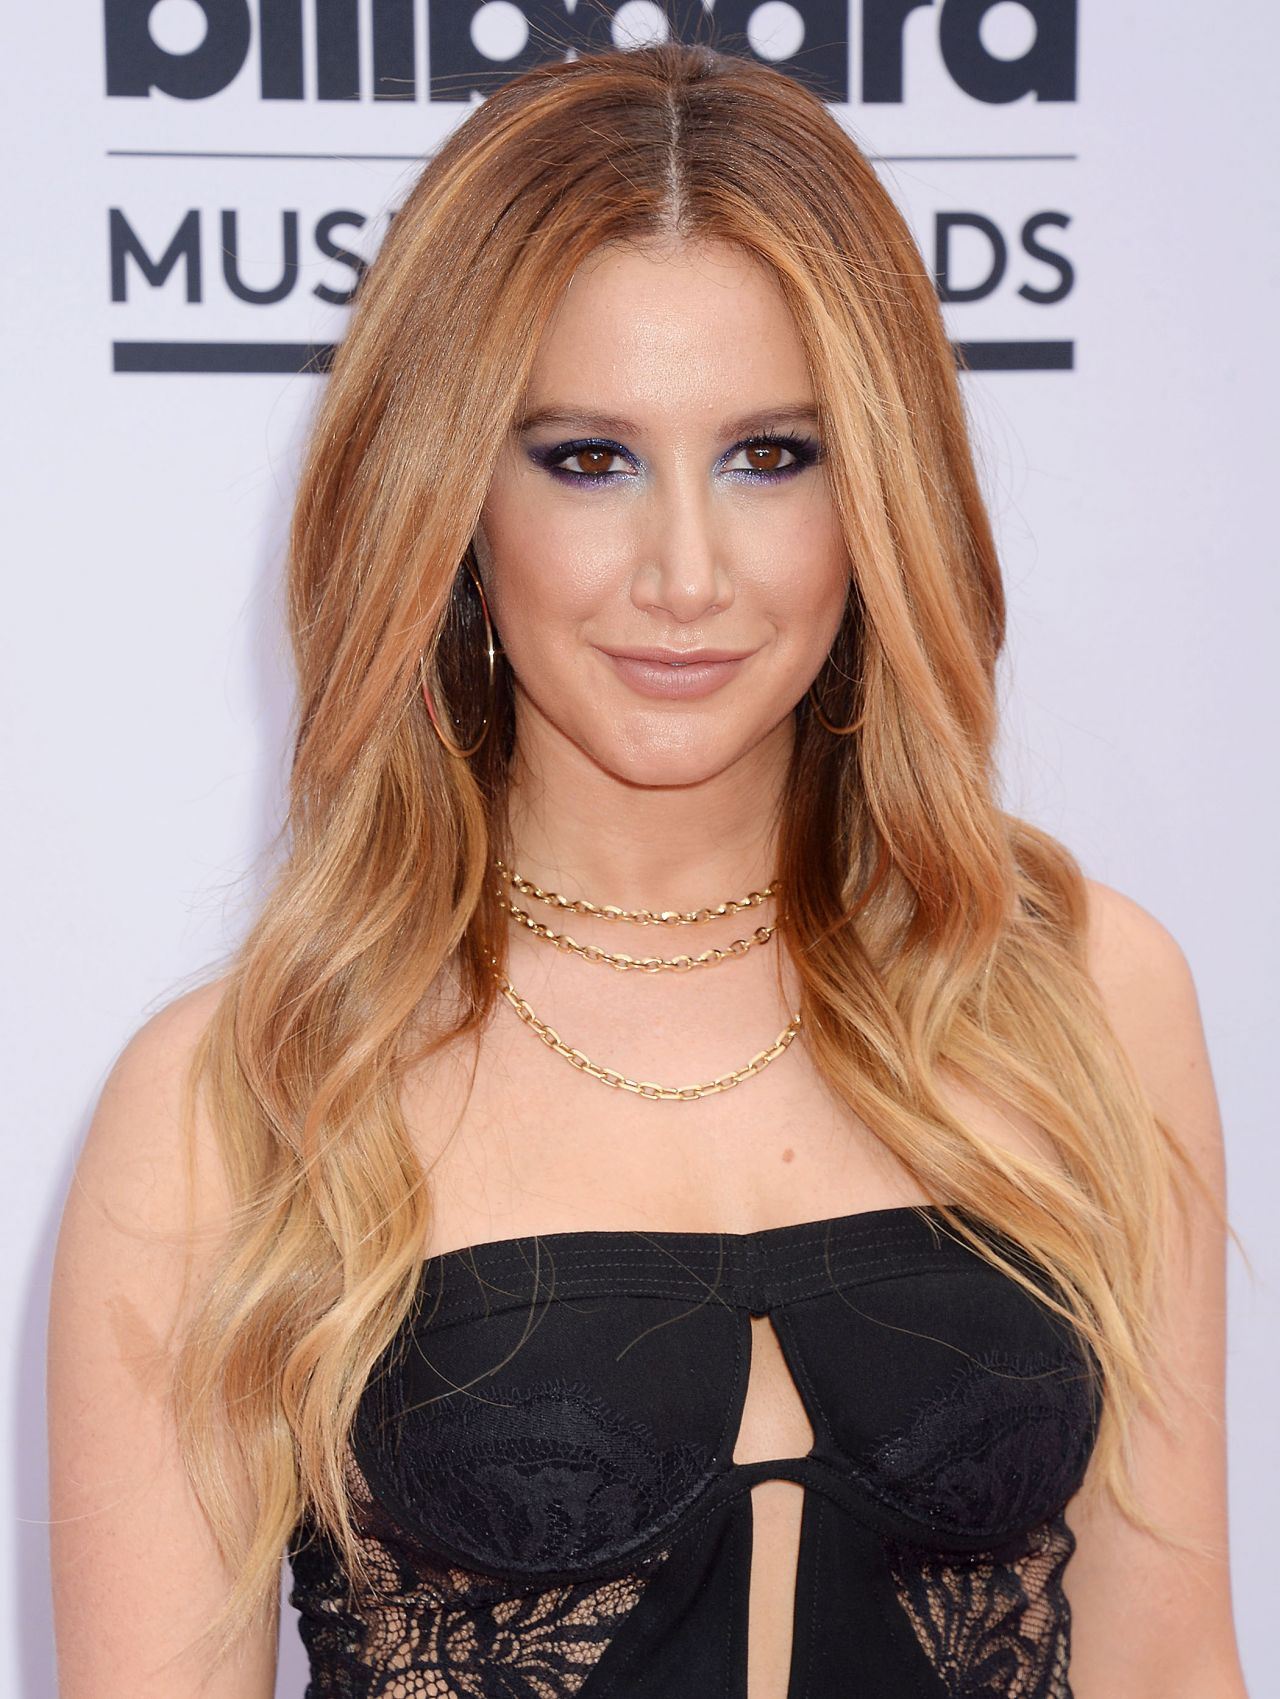 Ashley Tisdale Billboard Music Awards In Las Vegas 05 21